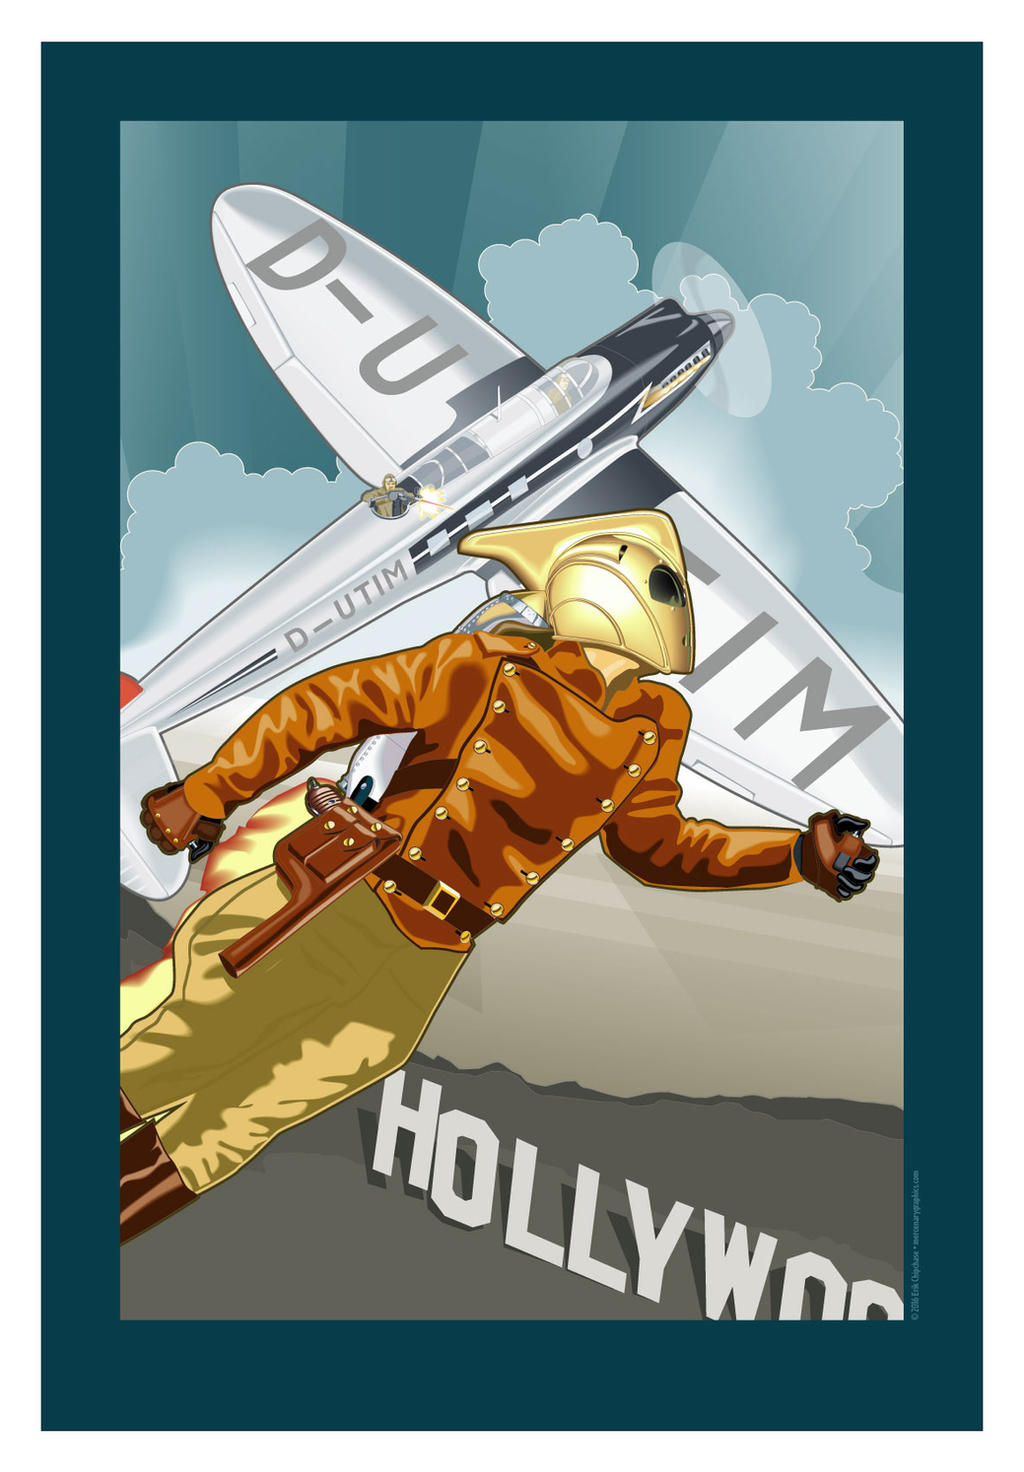 The Rocketeer by MercenaryGraphics